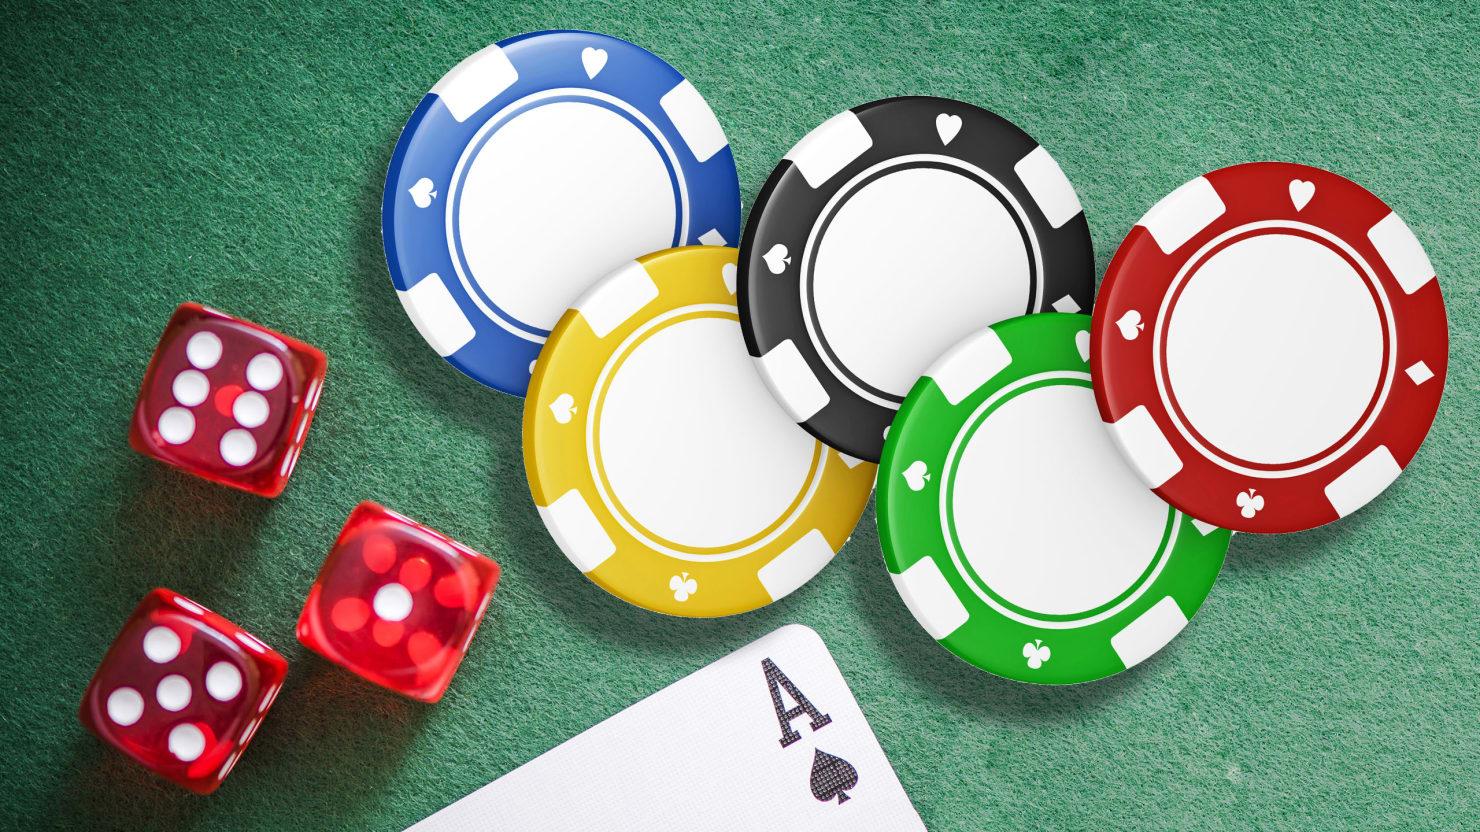 Situs Poker Online Agen Bandar Q Dan Domino99 Terpercaya